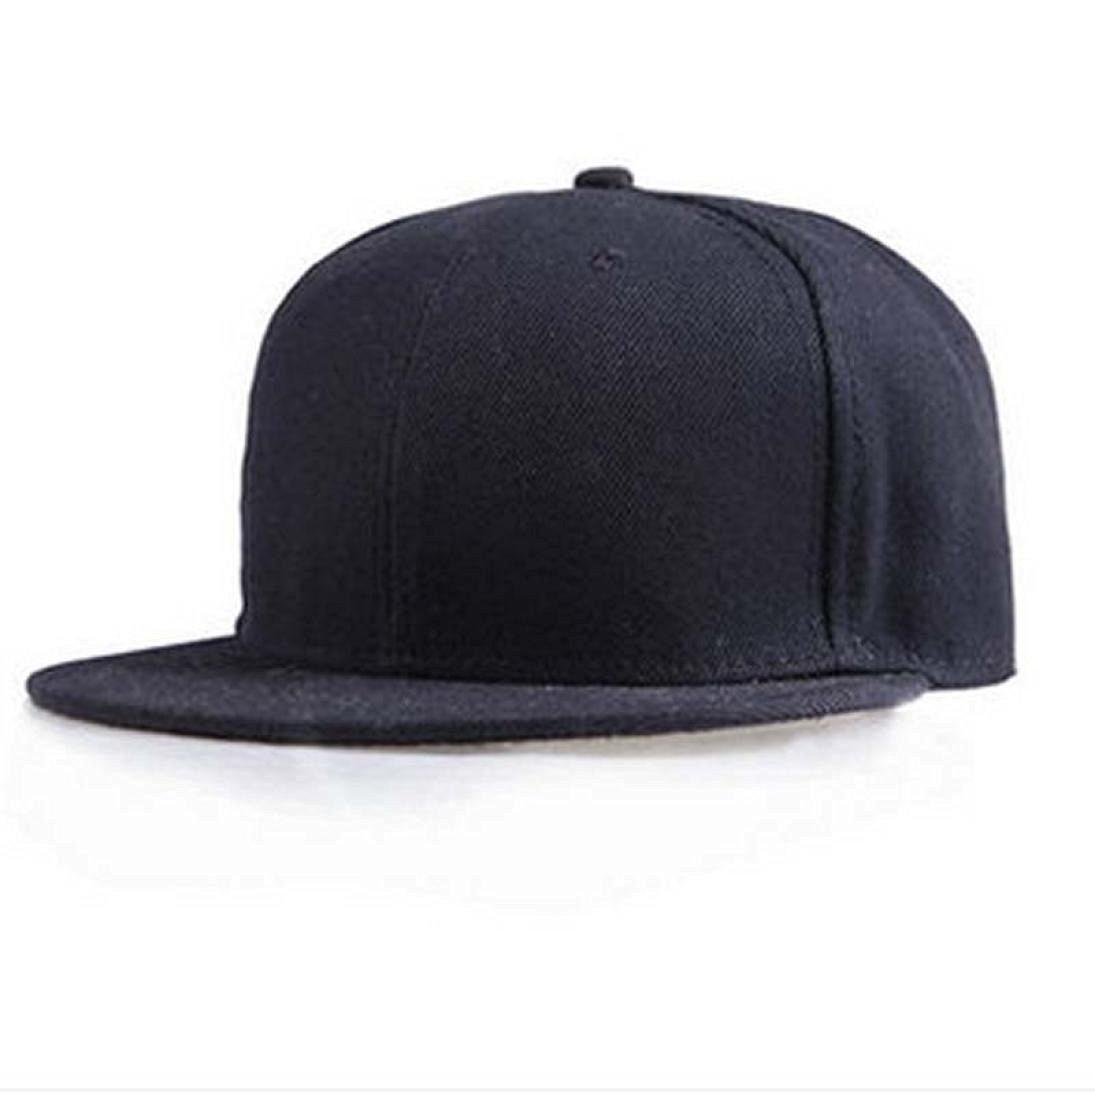 ac2eb84facf6c0 Get Quotations · Gotd Baseball Cap Fashion Unisex Plain Snapback Hats  Hip-Hop Adjustable Baseball Cap Solid Color